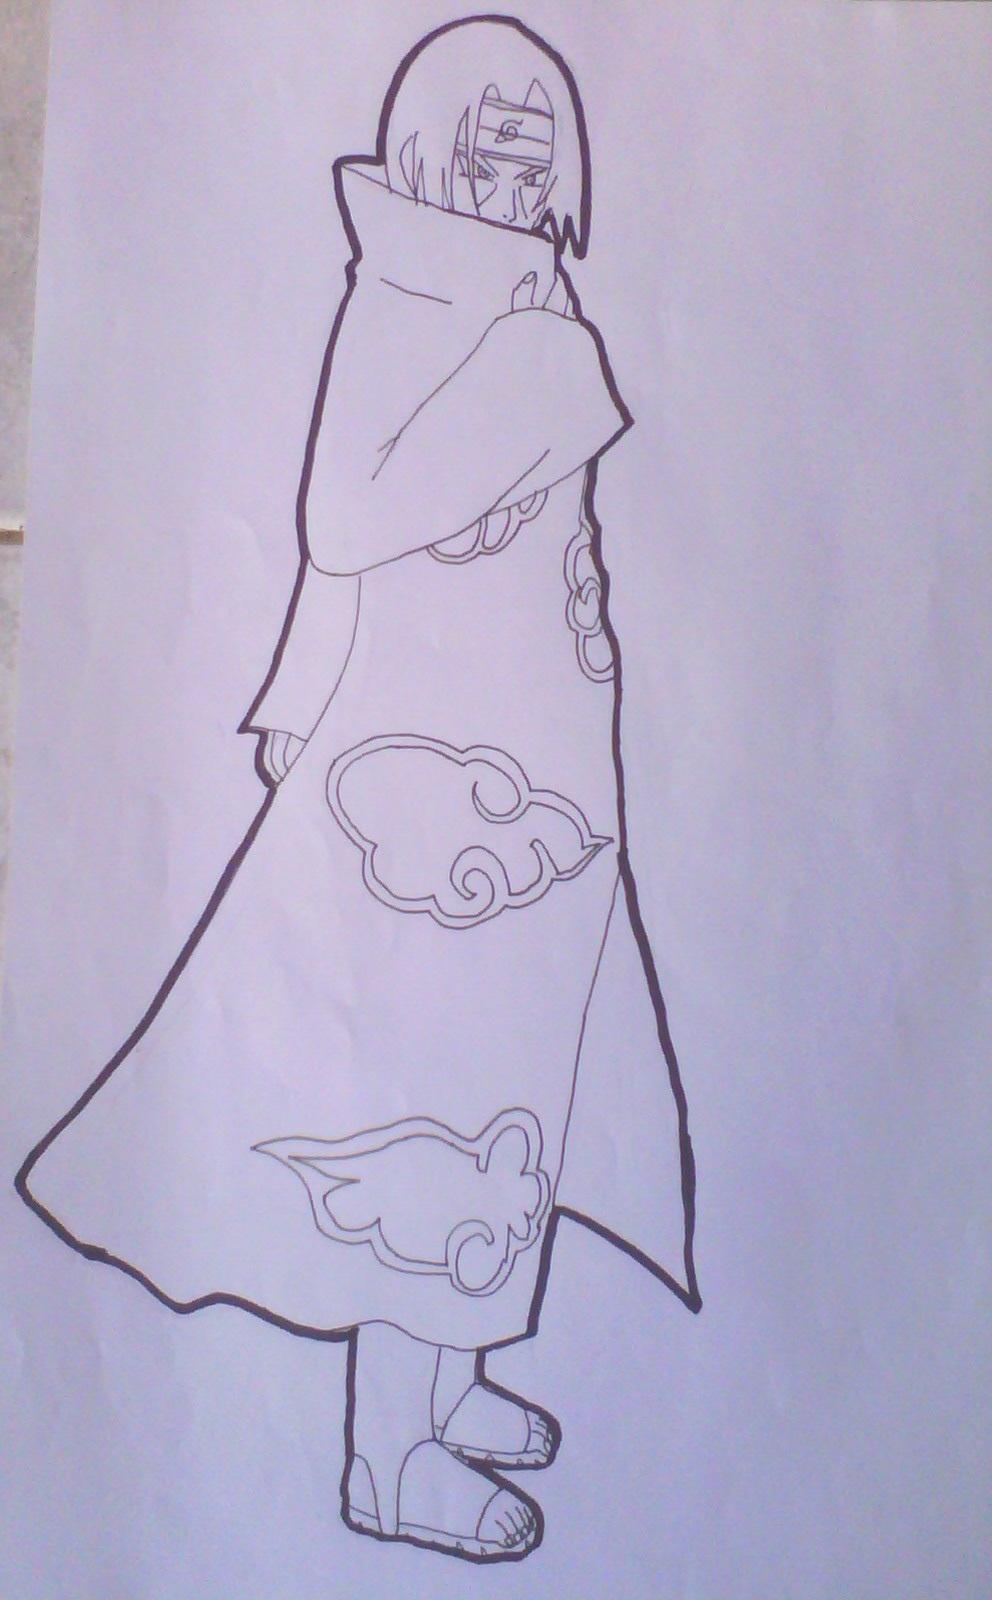 Itachi Uchiha 2 Drawing-Lineart by Krizeii on DeviantArt